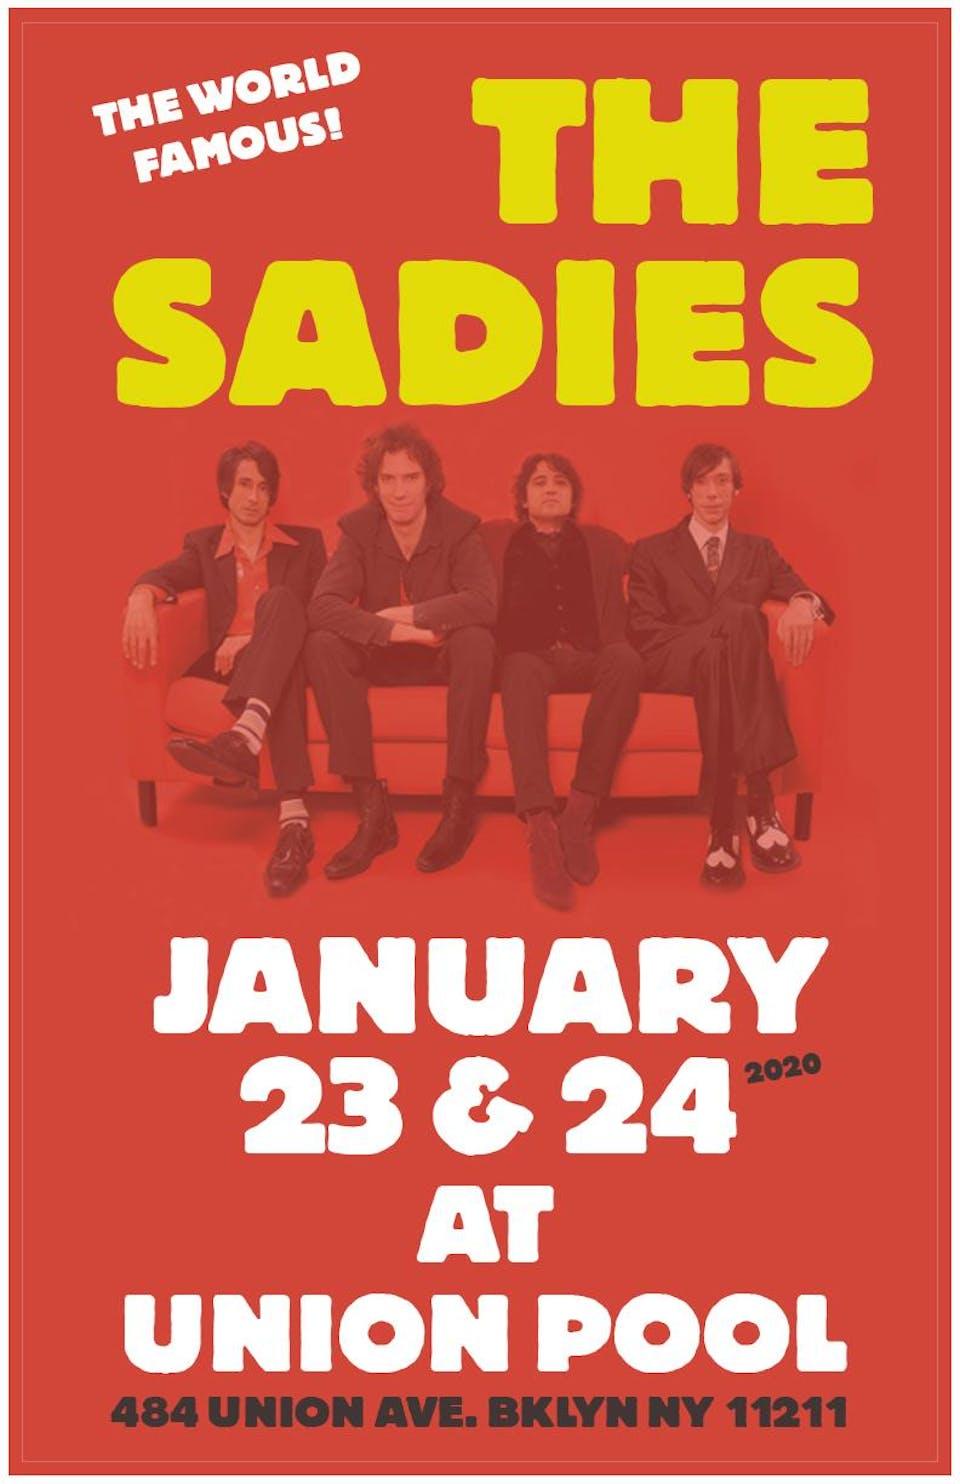 The Sadies! 2 sets!